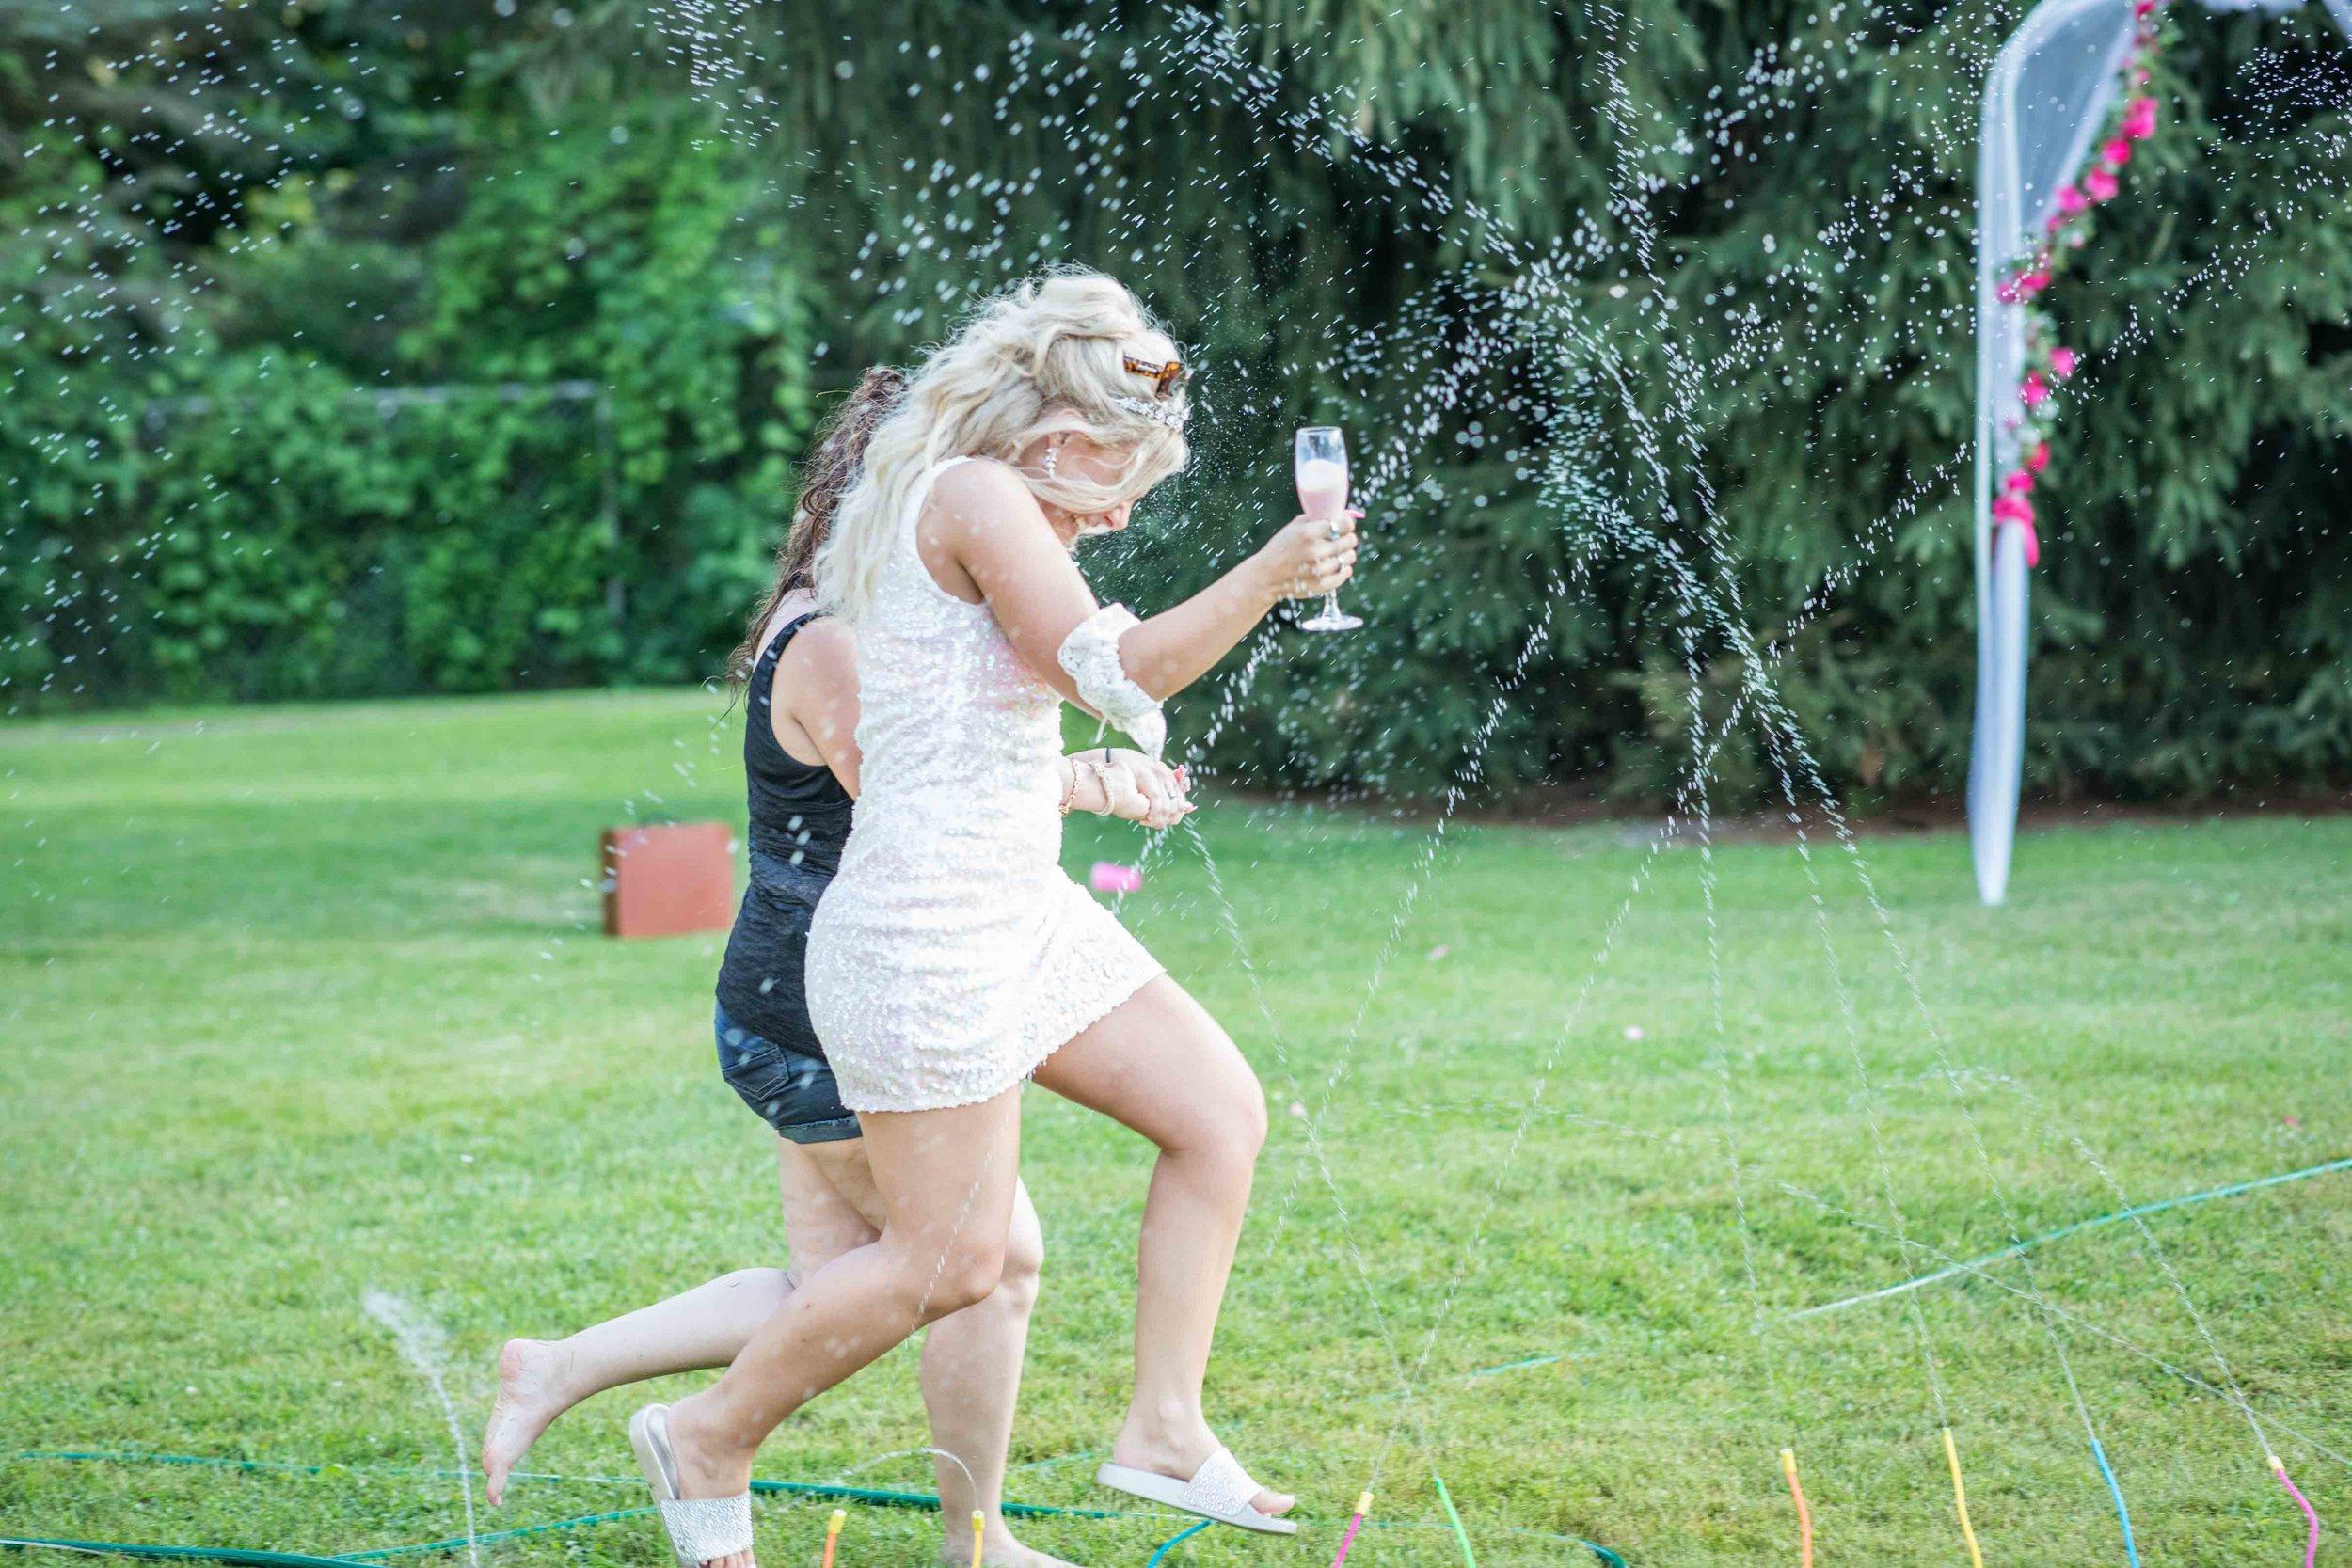 Bride running through a sprinkler system